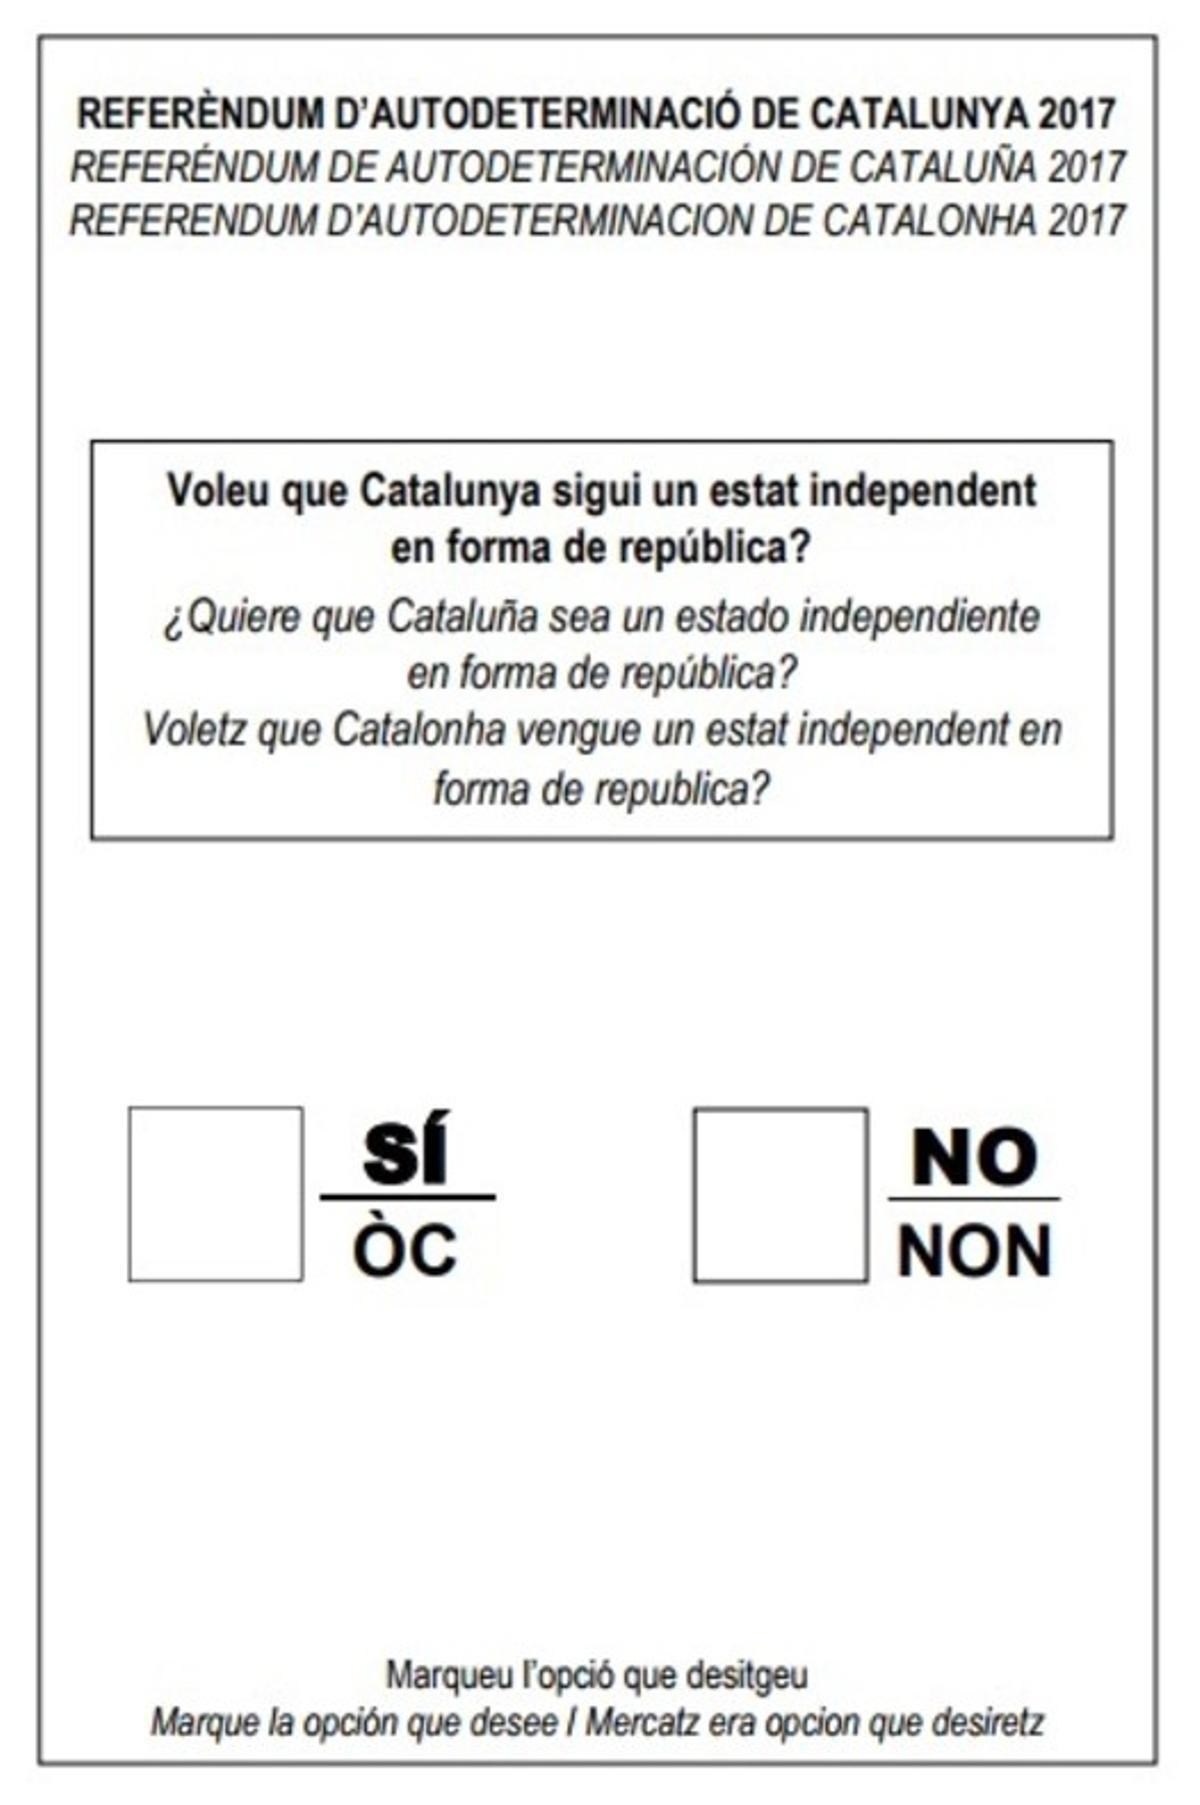 Papeleta del referéndum.